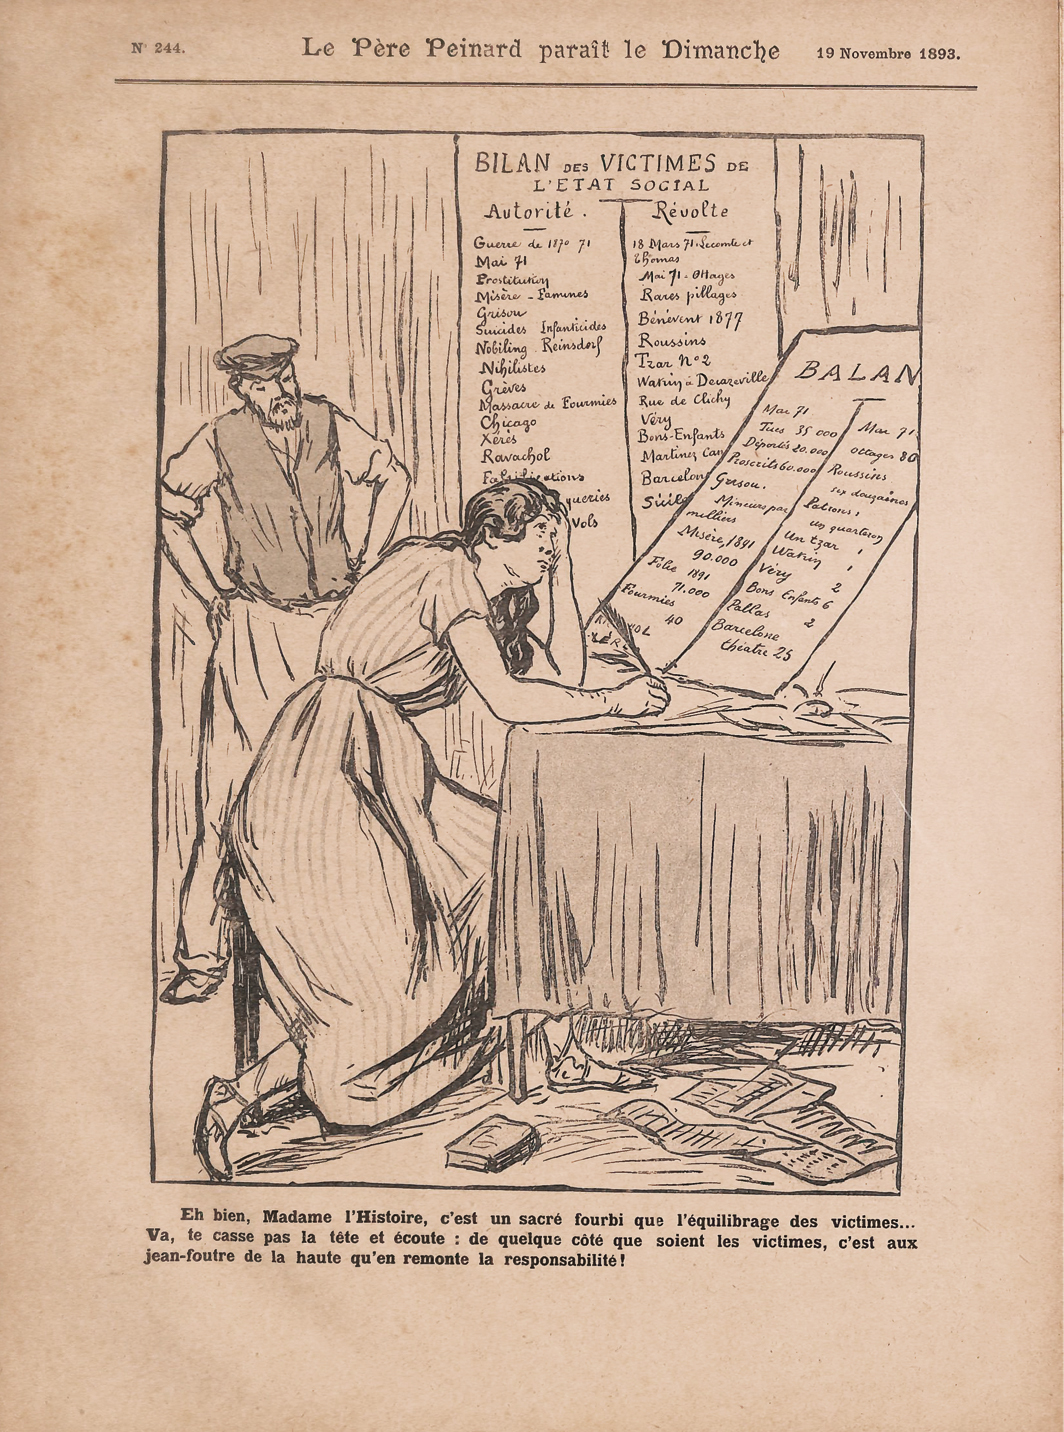 "Maximilien Luce, ""Bilan des victims de l'etat social"" (Balance Sheet of Victims of the Social State), 1893. From Le Père Peinard: Réflecs hebdomadaires d'un gniaff (Old Papa Workhorse: Weekly Reflections of a Cobbler), November 19, 1893."